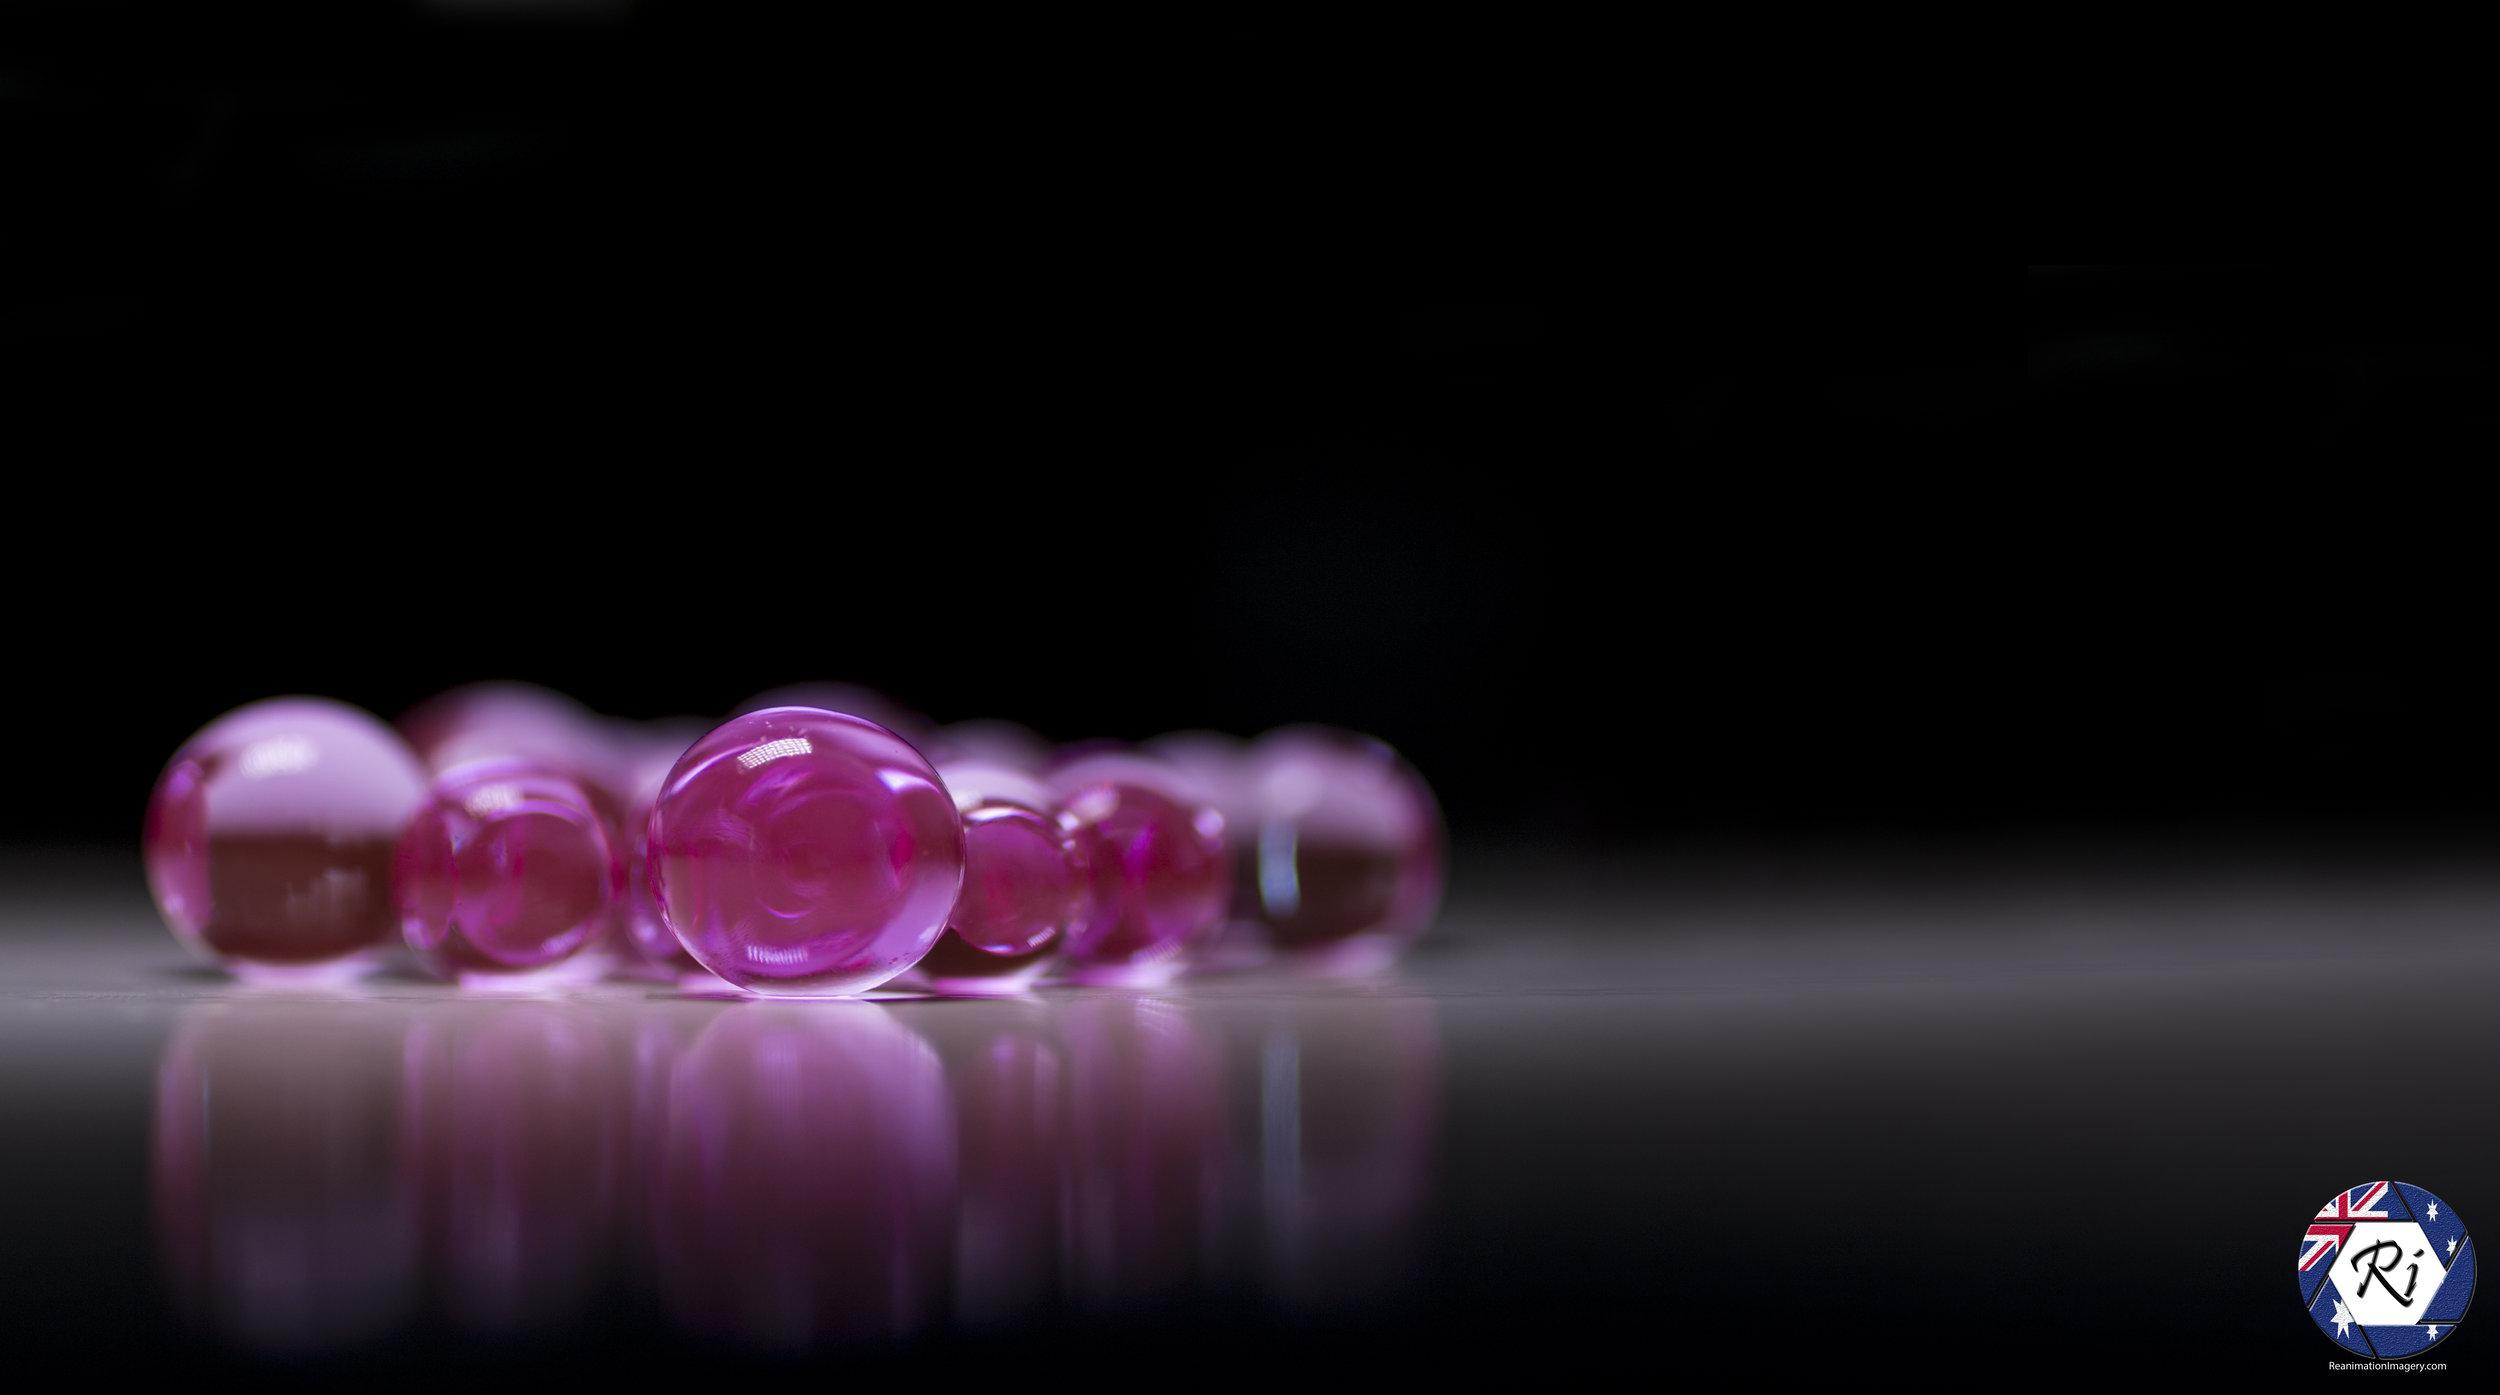 stock-photo-balls-80786365.jpg